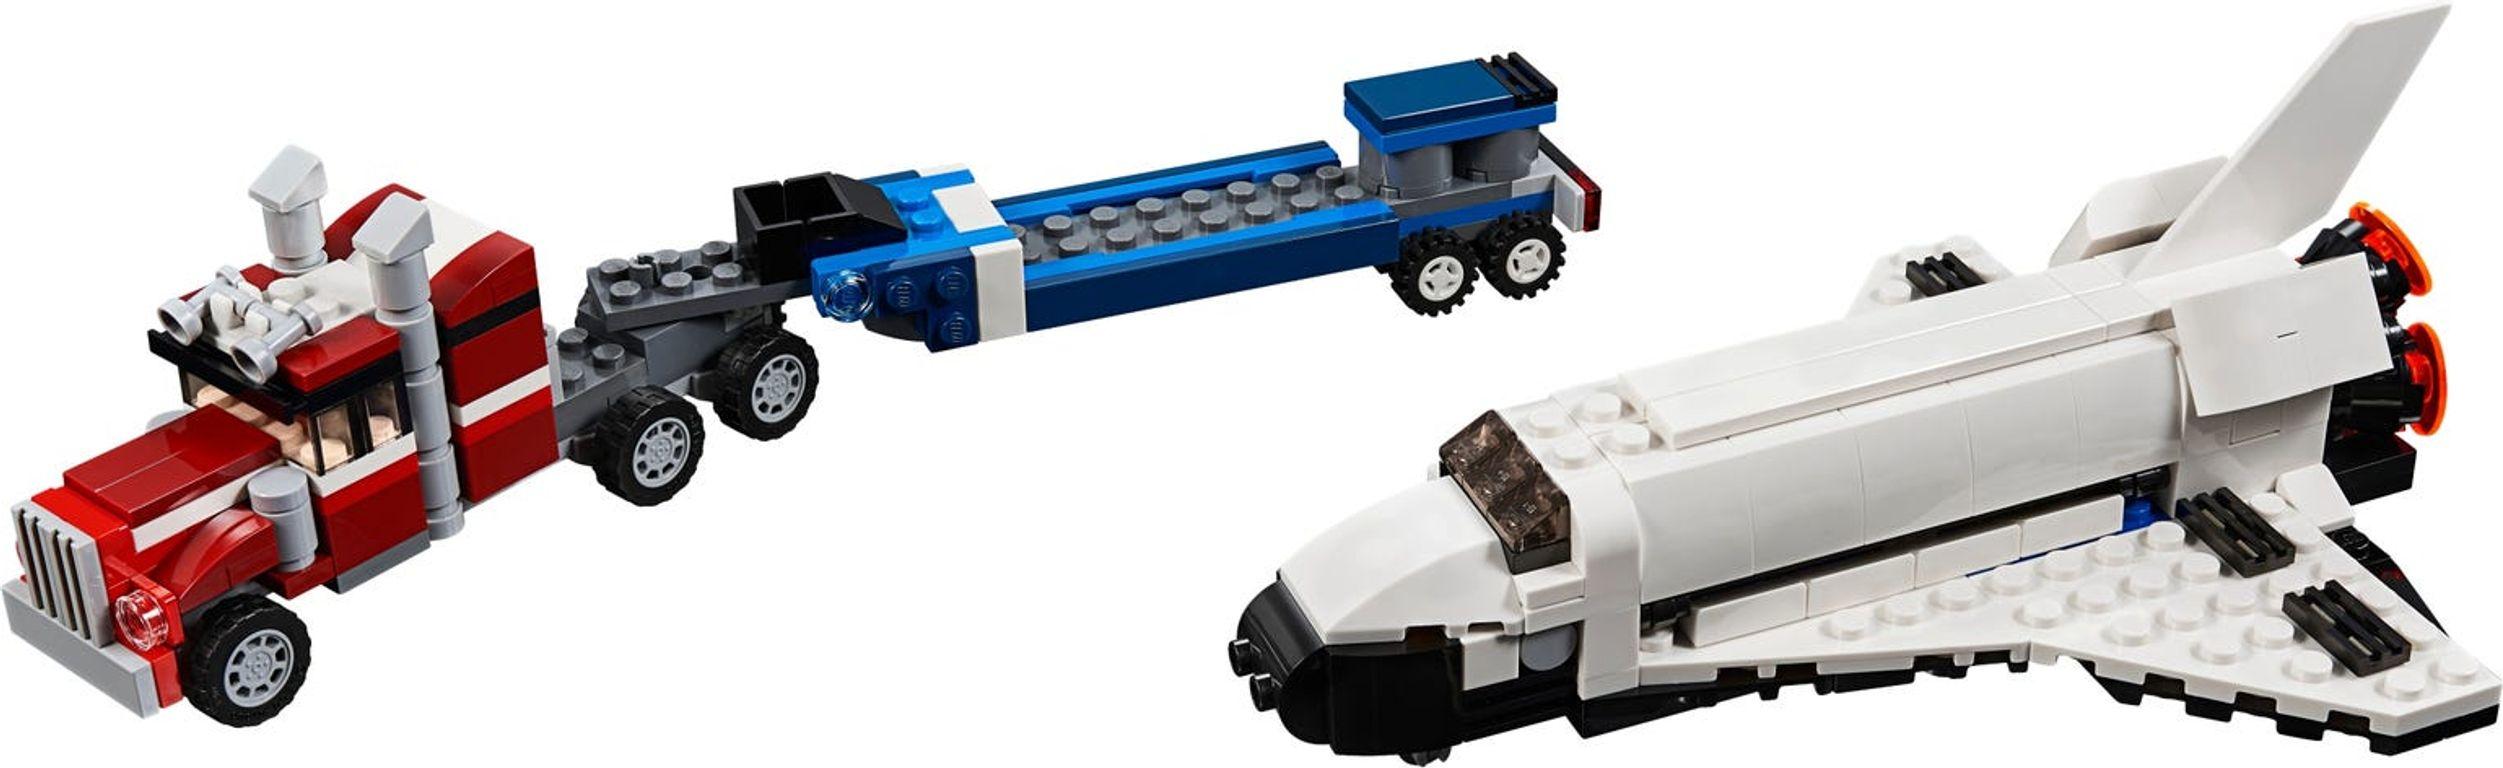 Shuttle Transporter components